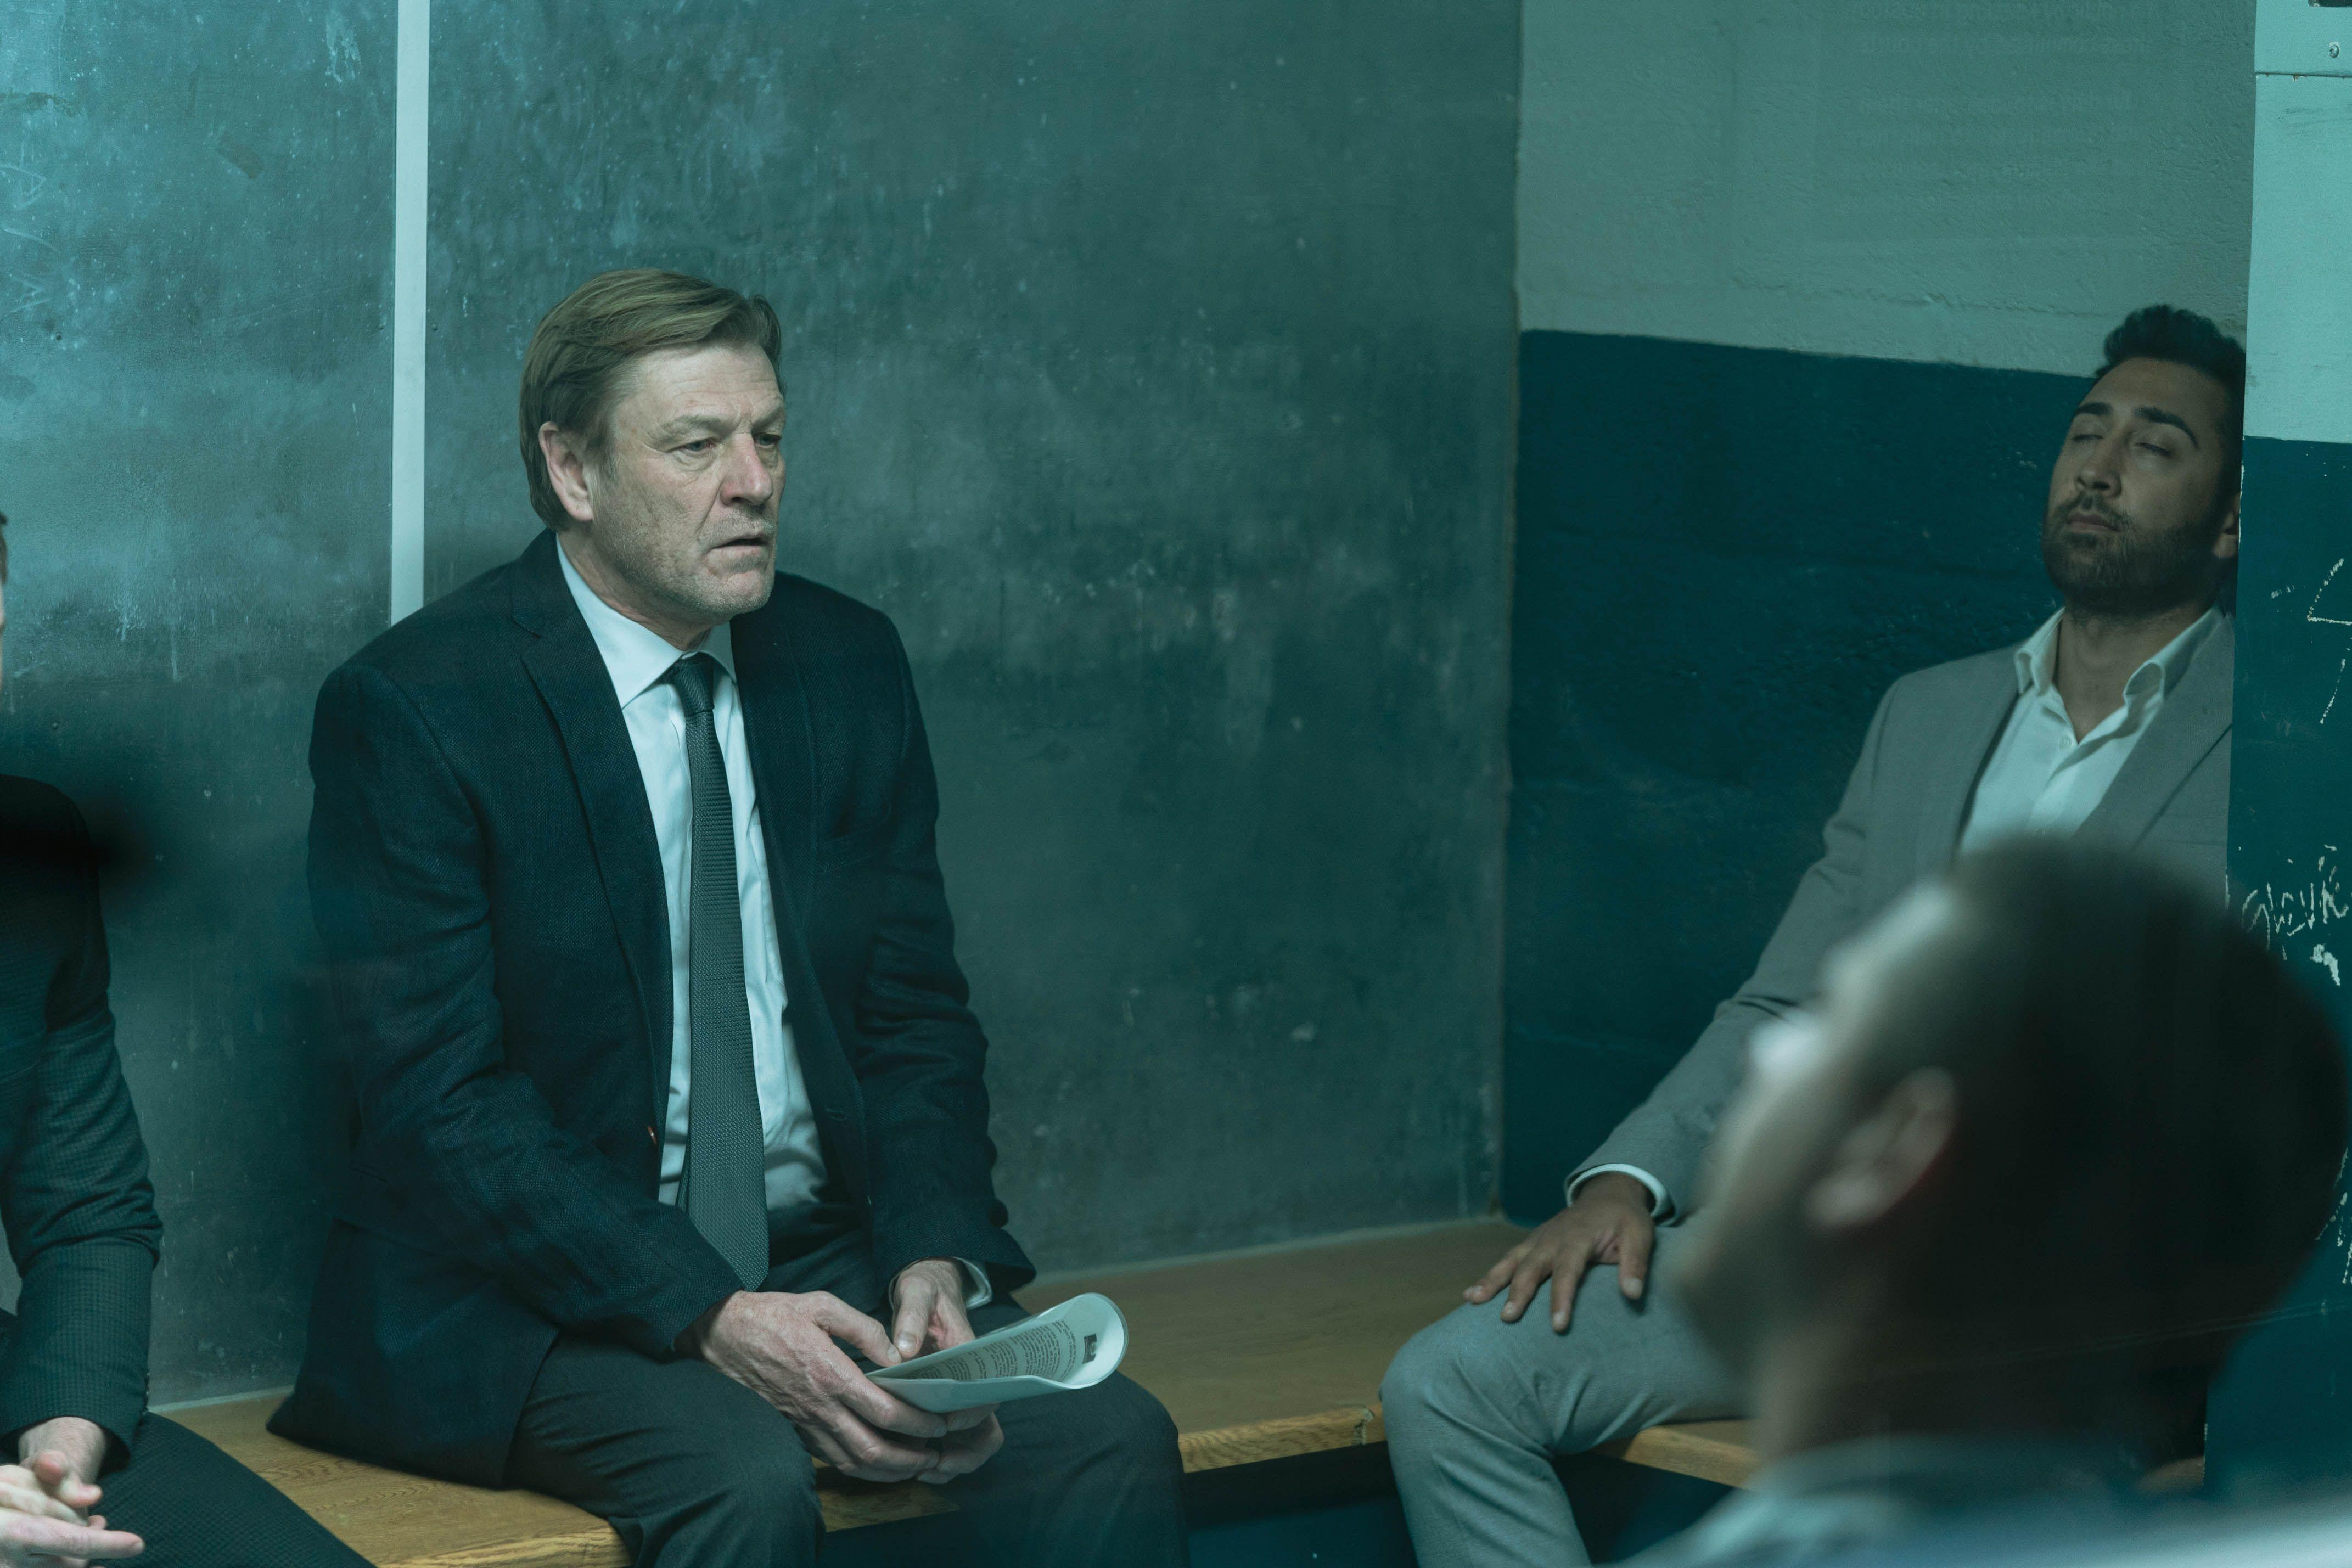 'Time' Episode 3 Recap: Retribution and Atonement